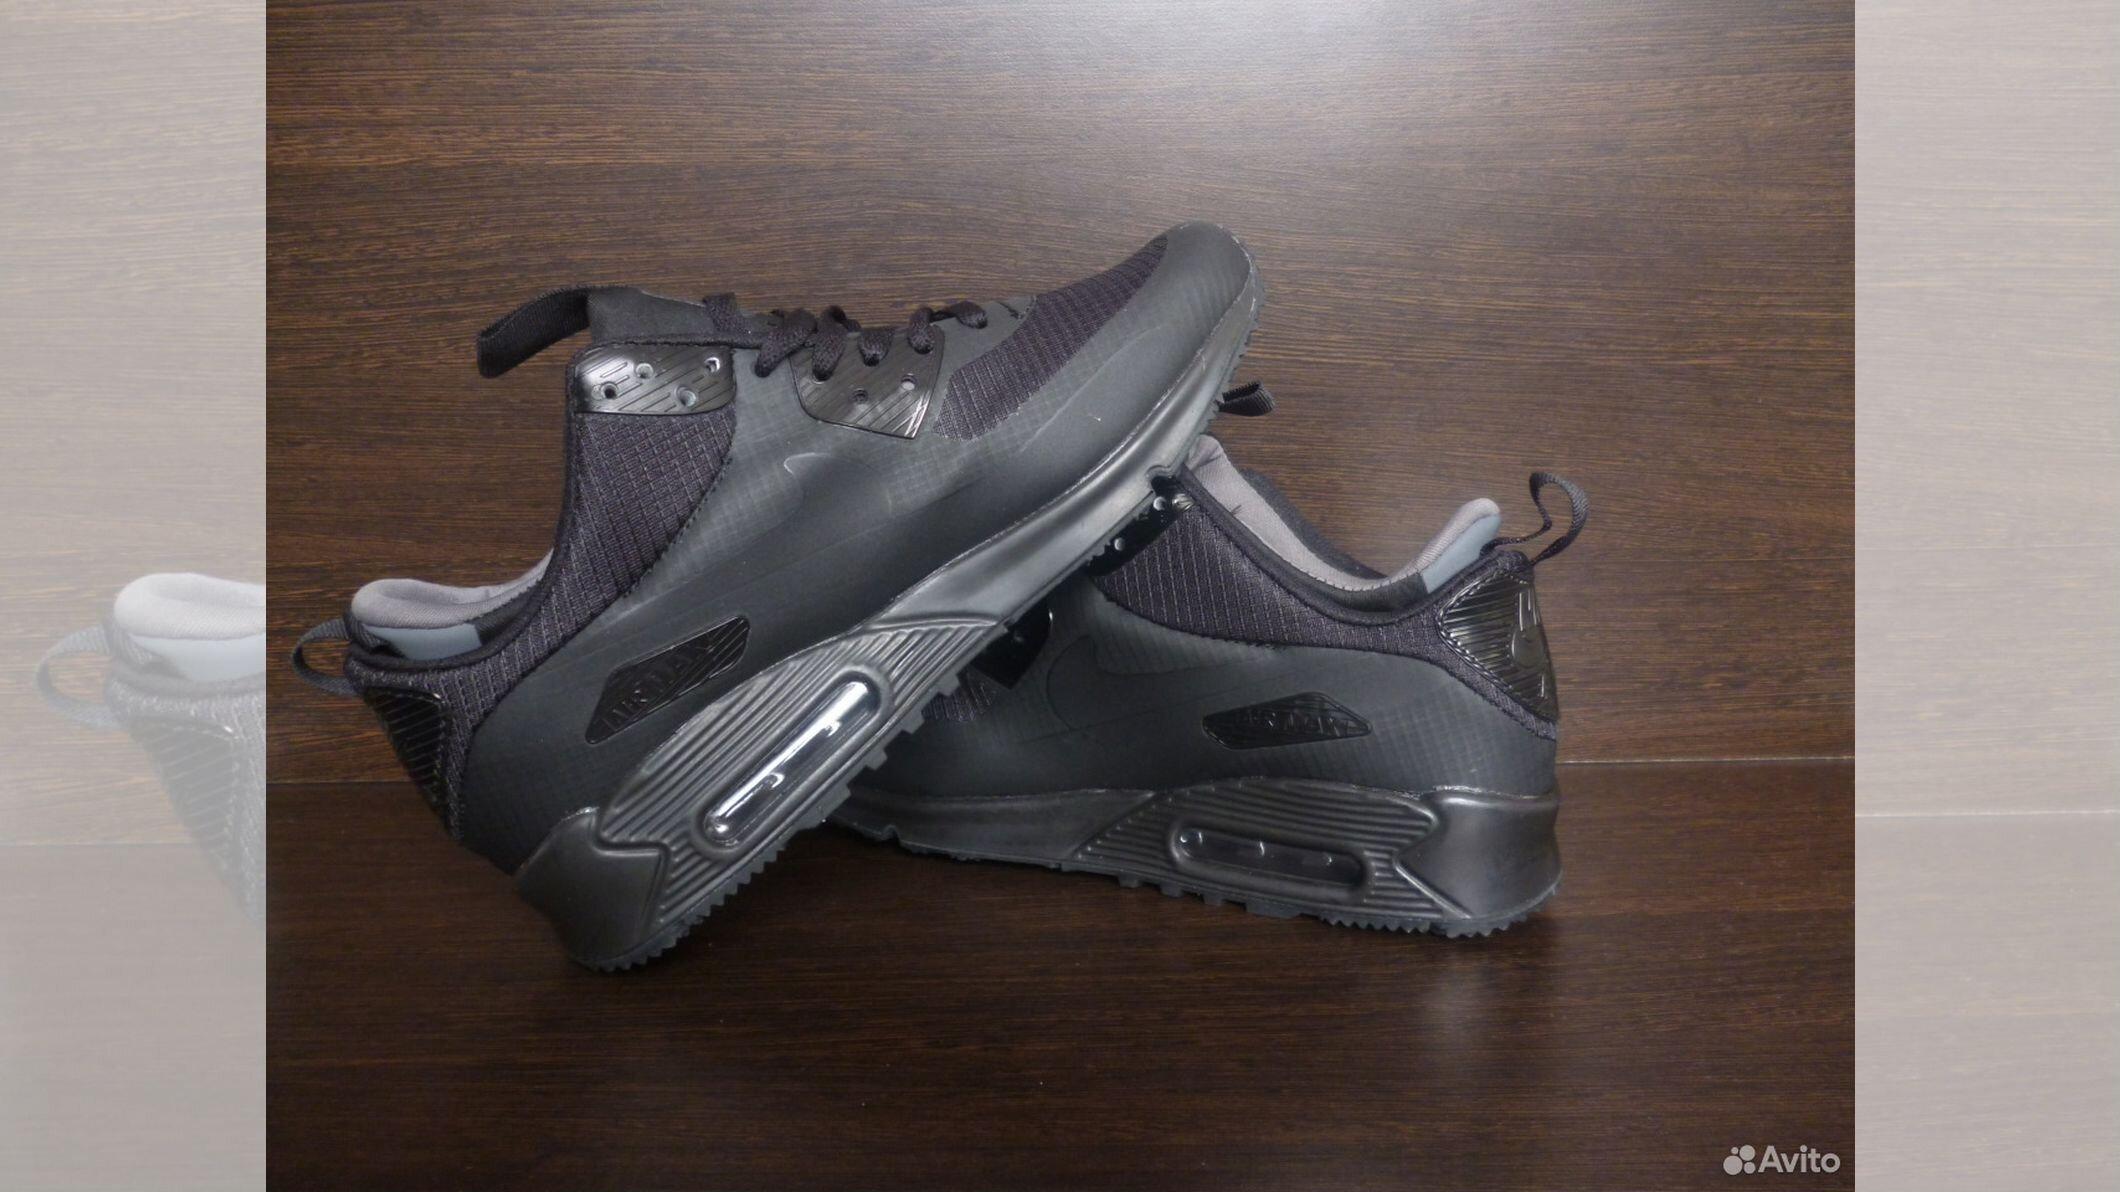 Кроссовки Nike Air Max 90 Mid Winter Black купить в Воронежской области на  Avito — Объявления на сайте Авито 9565f97e57e